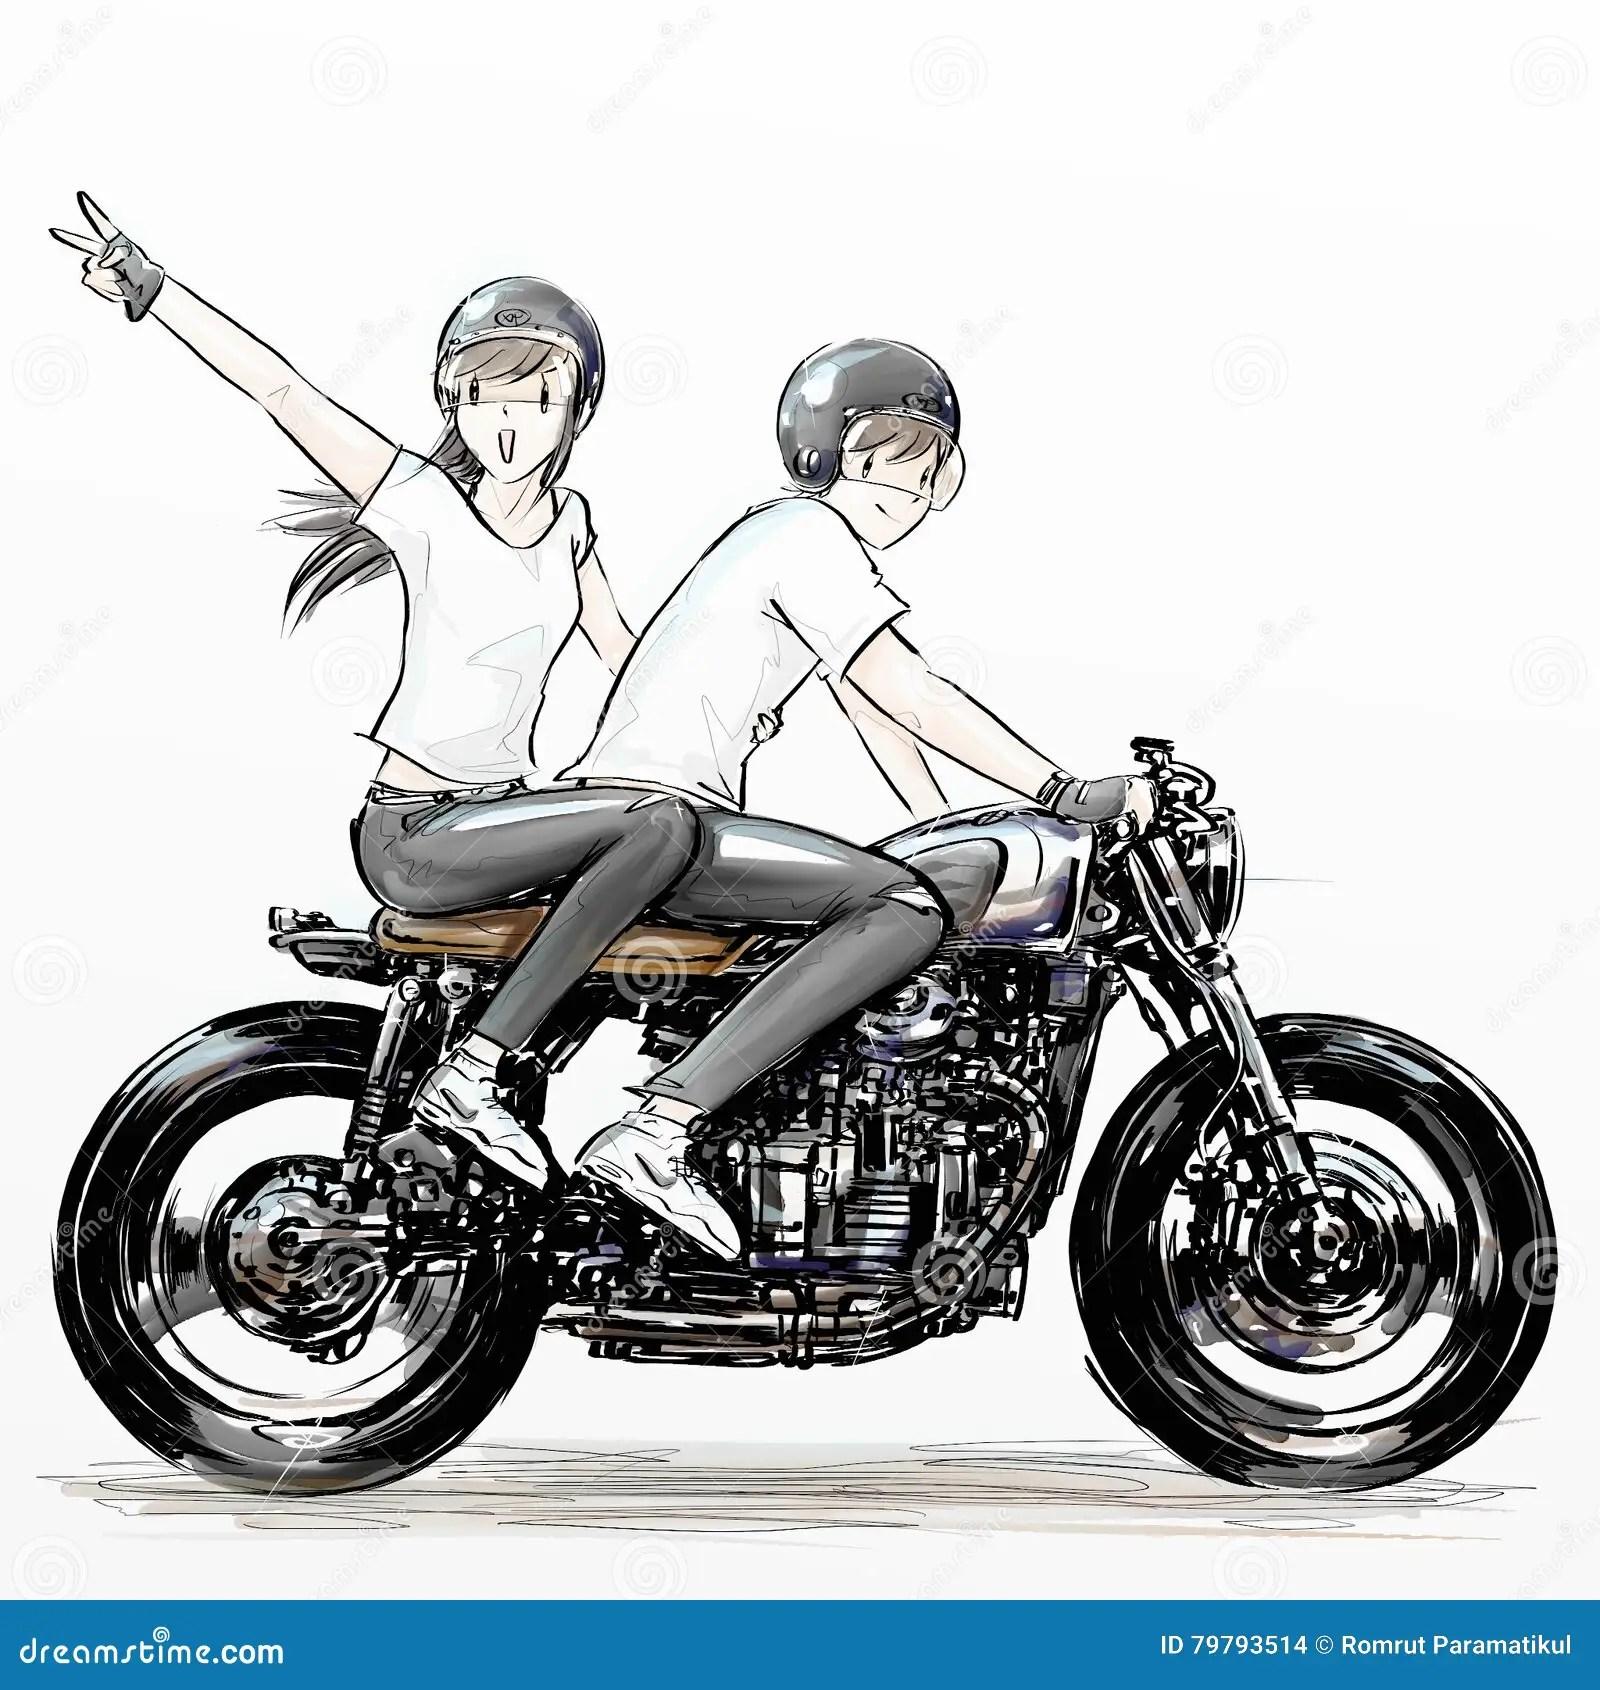 Cute Cartoon Boy And Girl Riding Motorcycle Stock